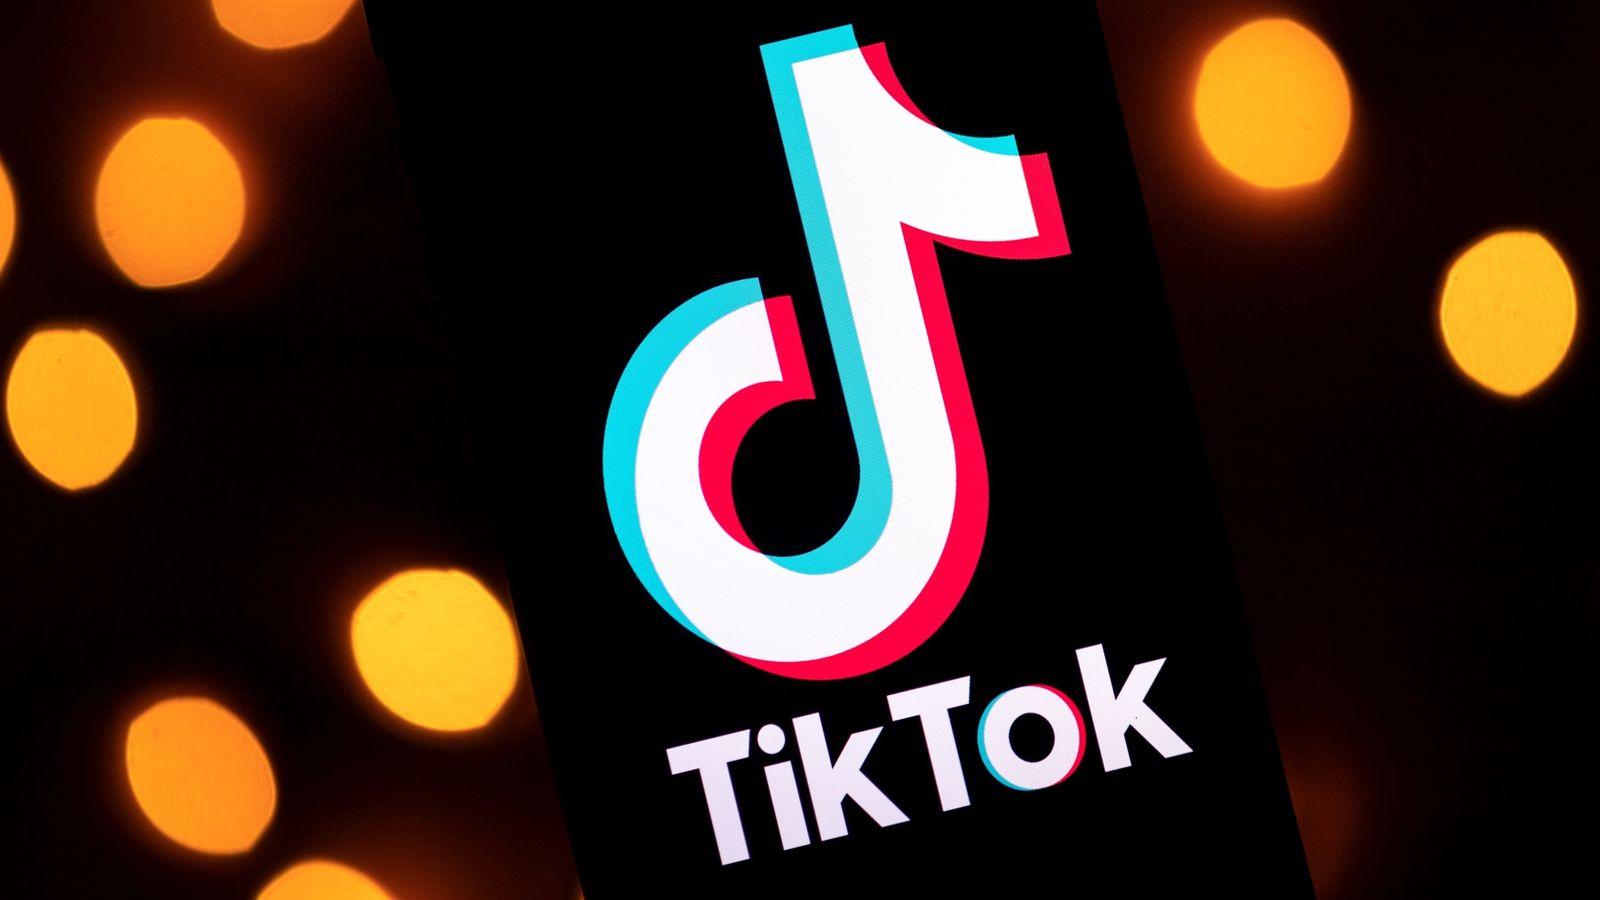 The popularity of tiktok keeps expanding